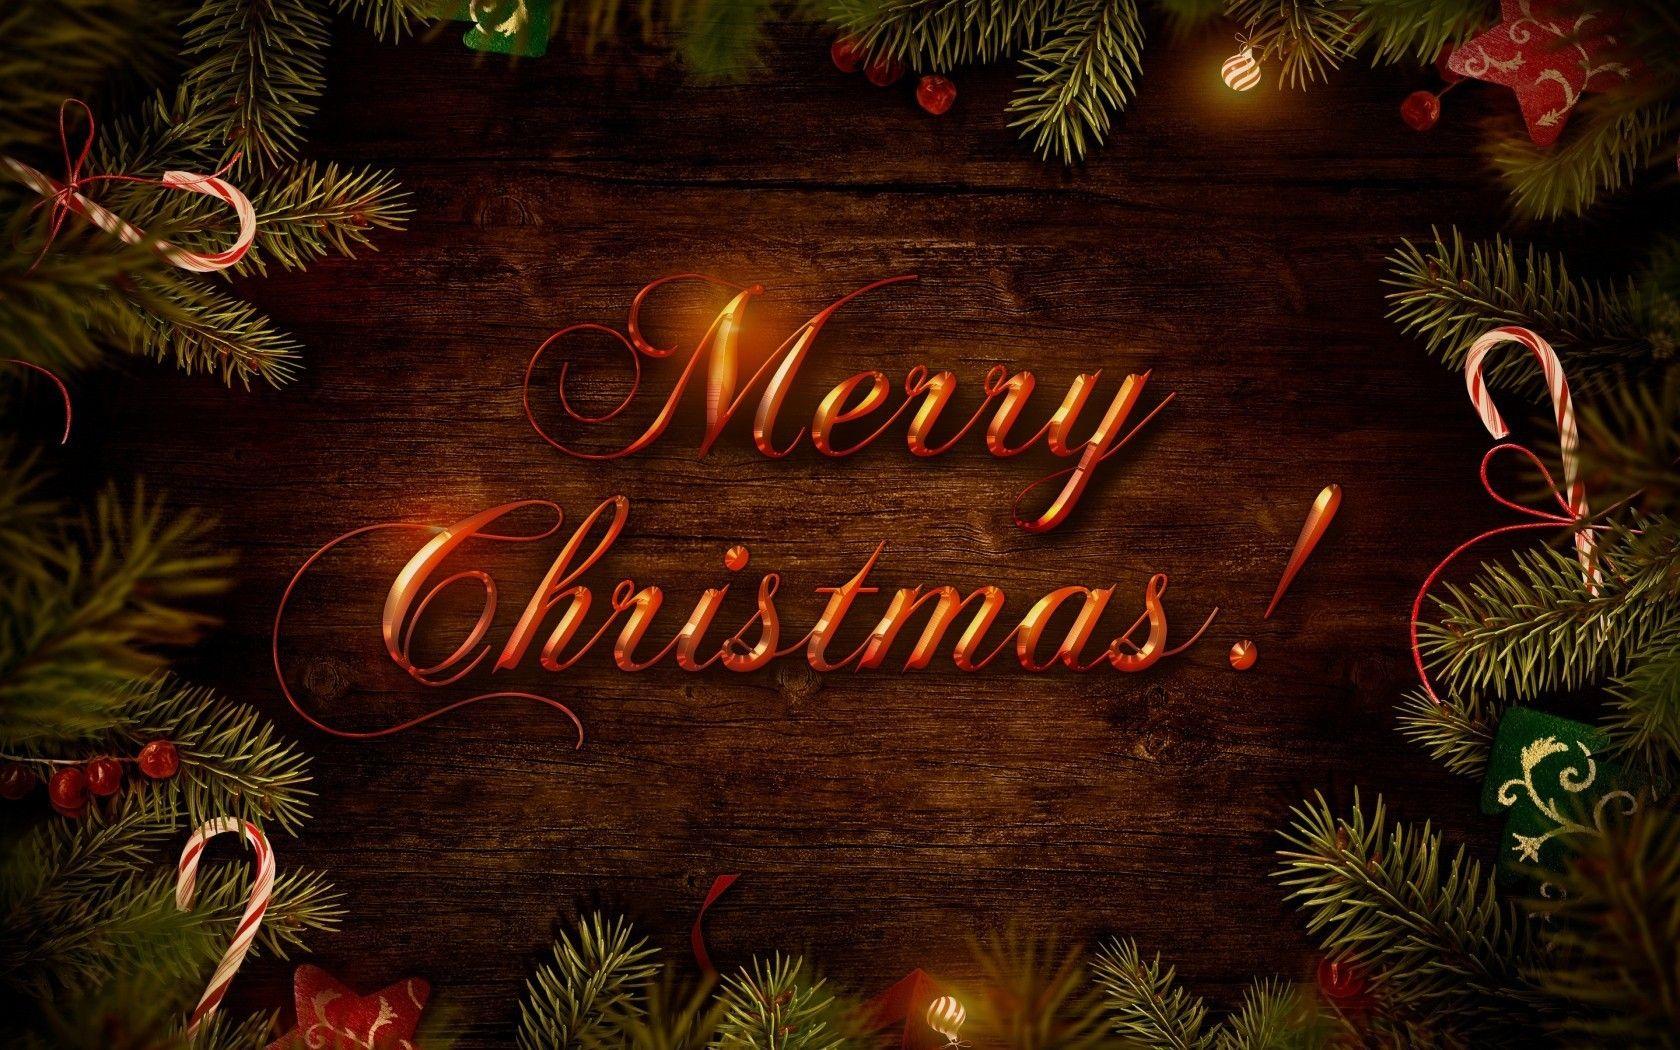 Christmas (1680x1050) Via Www.allwallpaper.in